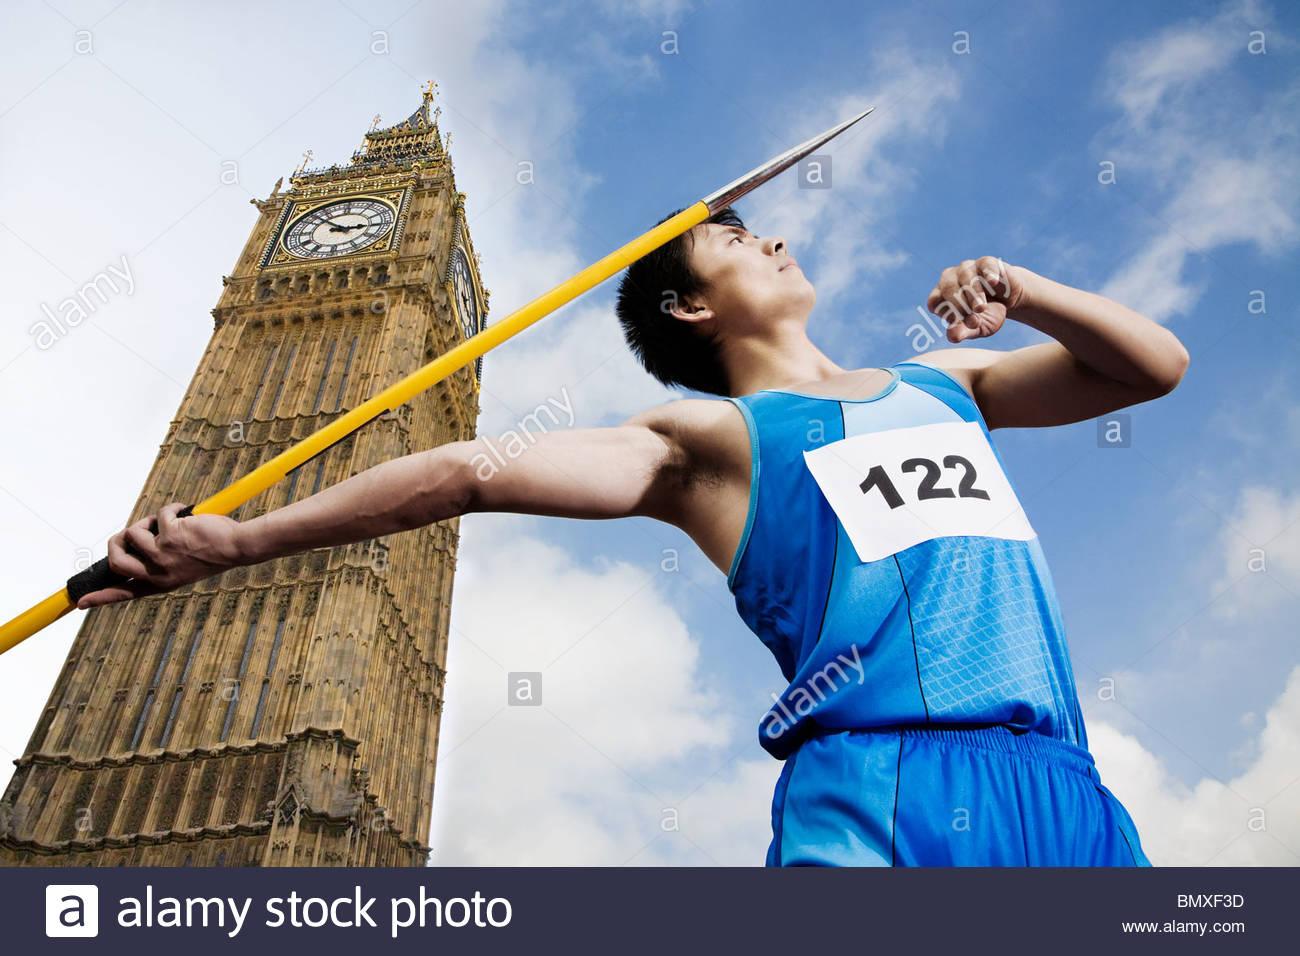 Javelin thrower by big ben - Stock Image